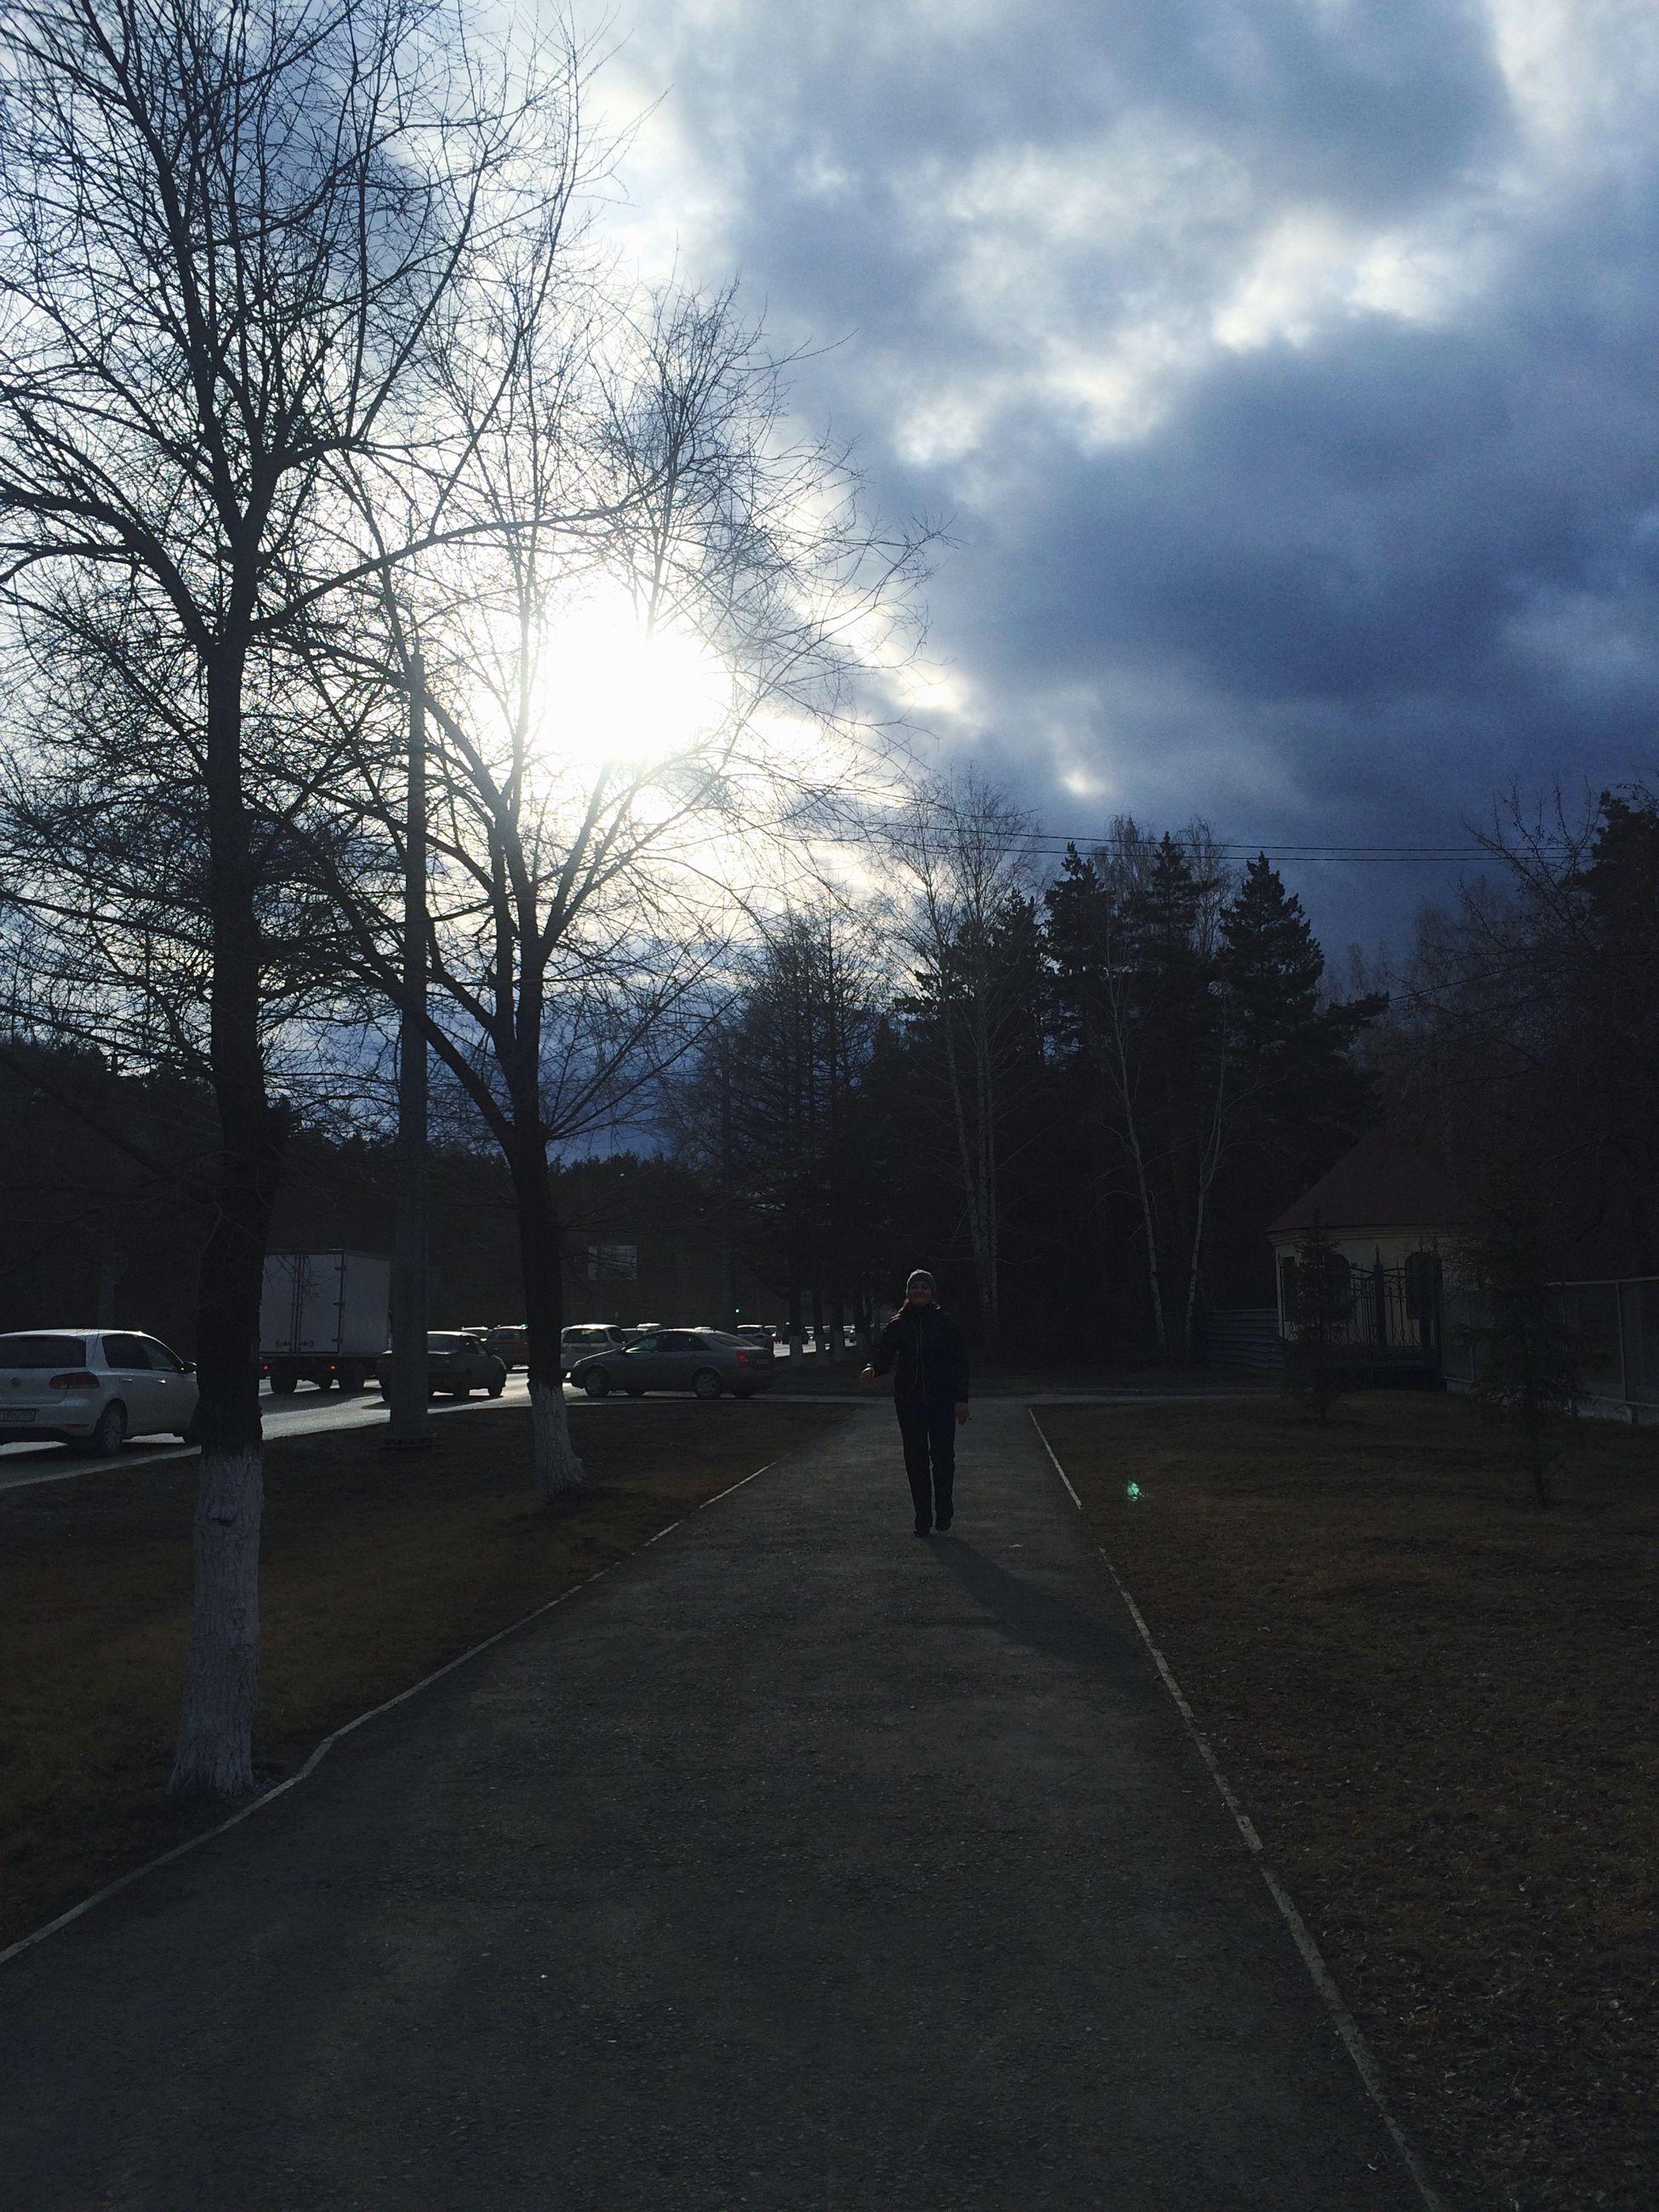 tree, transportation, sky, road, silhouette, the way forward, street, cloud - sky, bare tree, land vehicle, mode of transport, walking, men, sunset, full length, car, bicycle, cloud